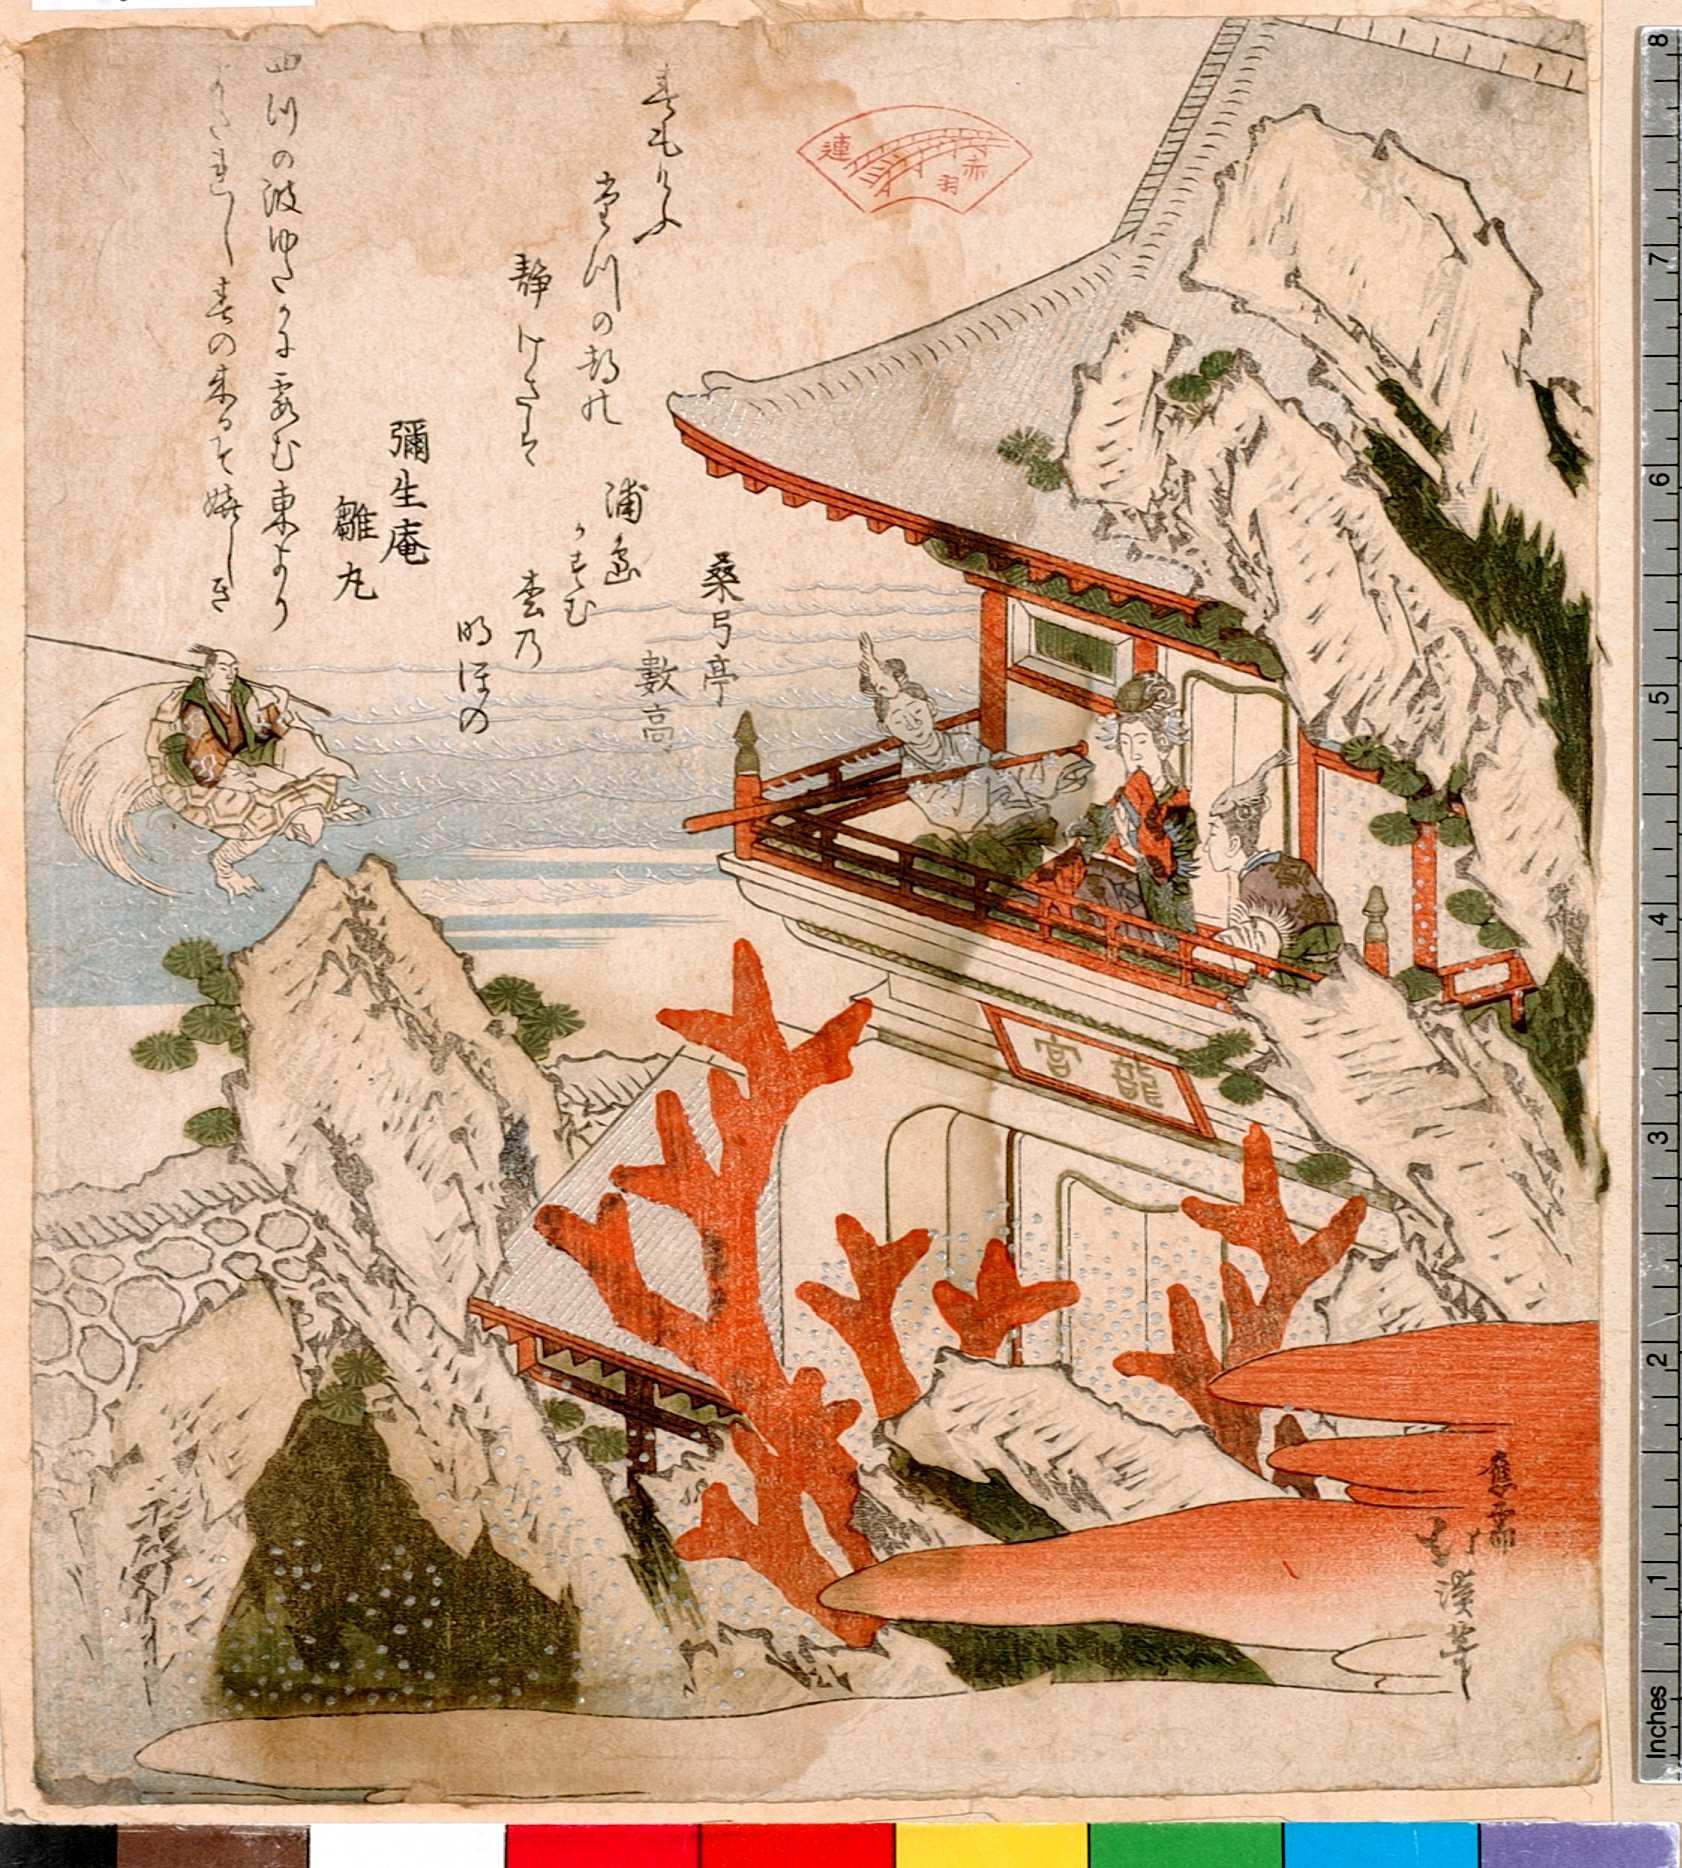 Frank Lloyd Wright Prints Totoya Hokkei Ritsumeikan University Ukiyo E Search